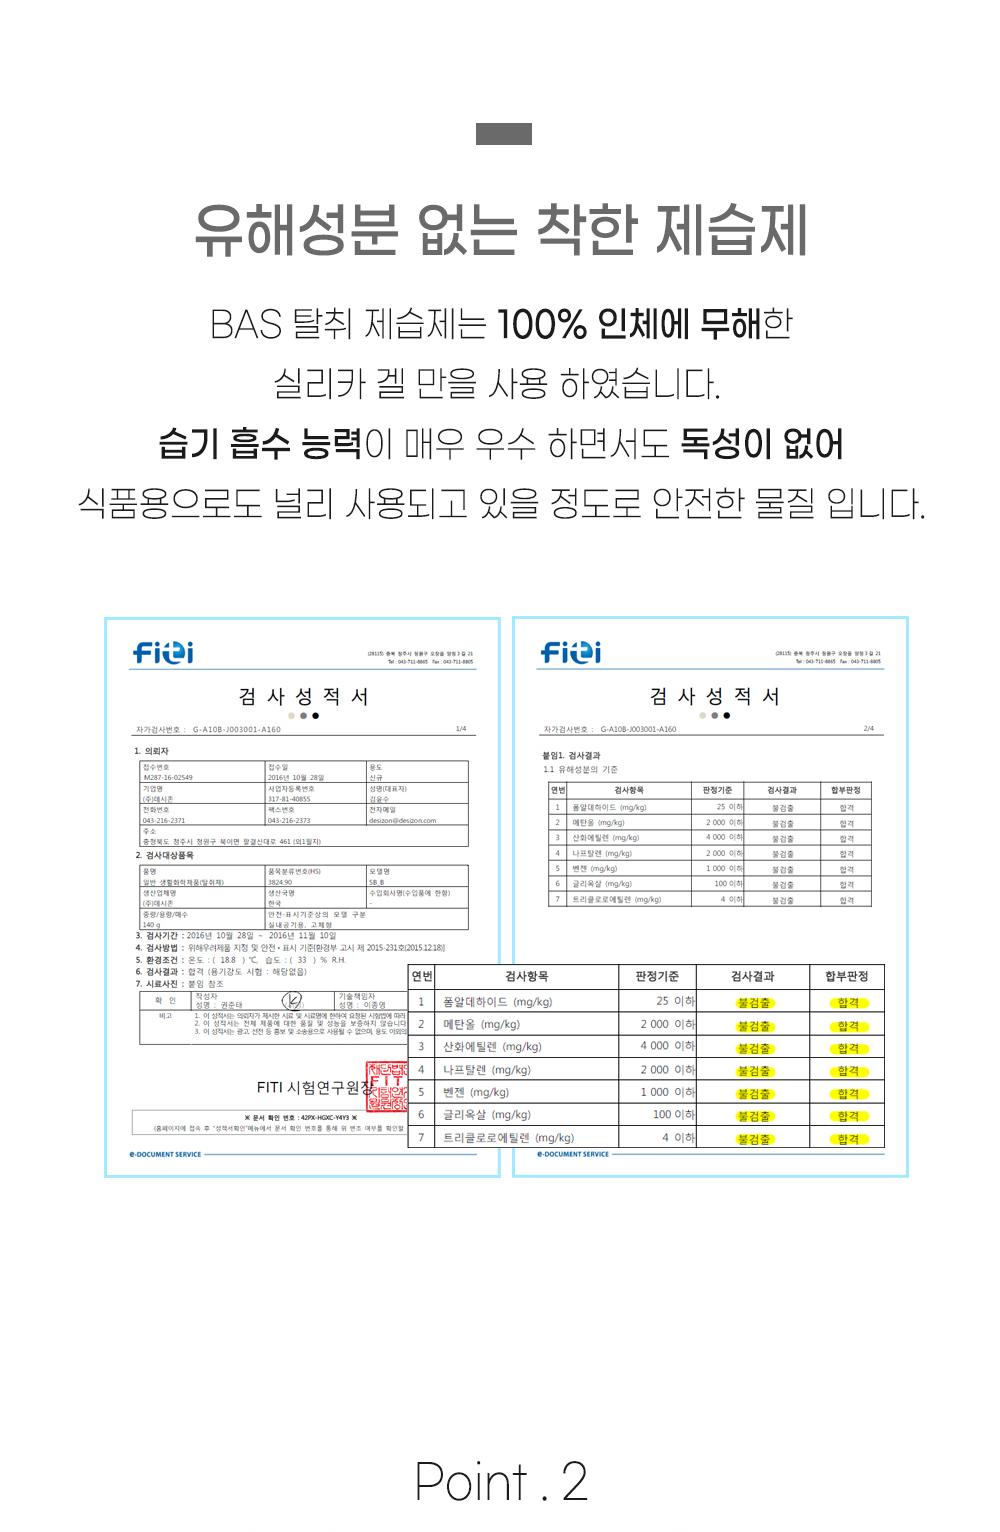 bas_silica_2_04.jpg